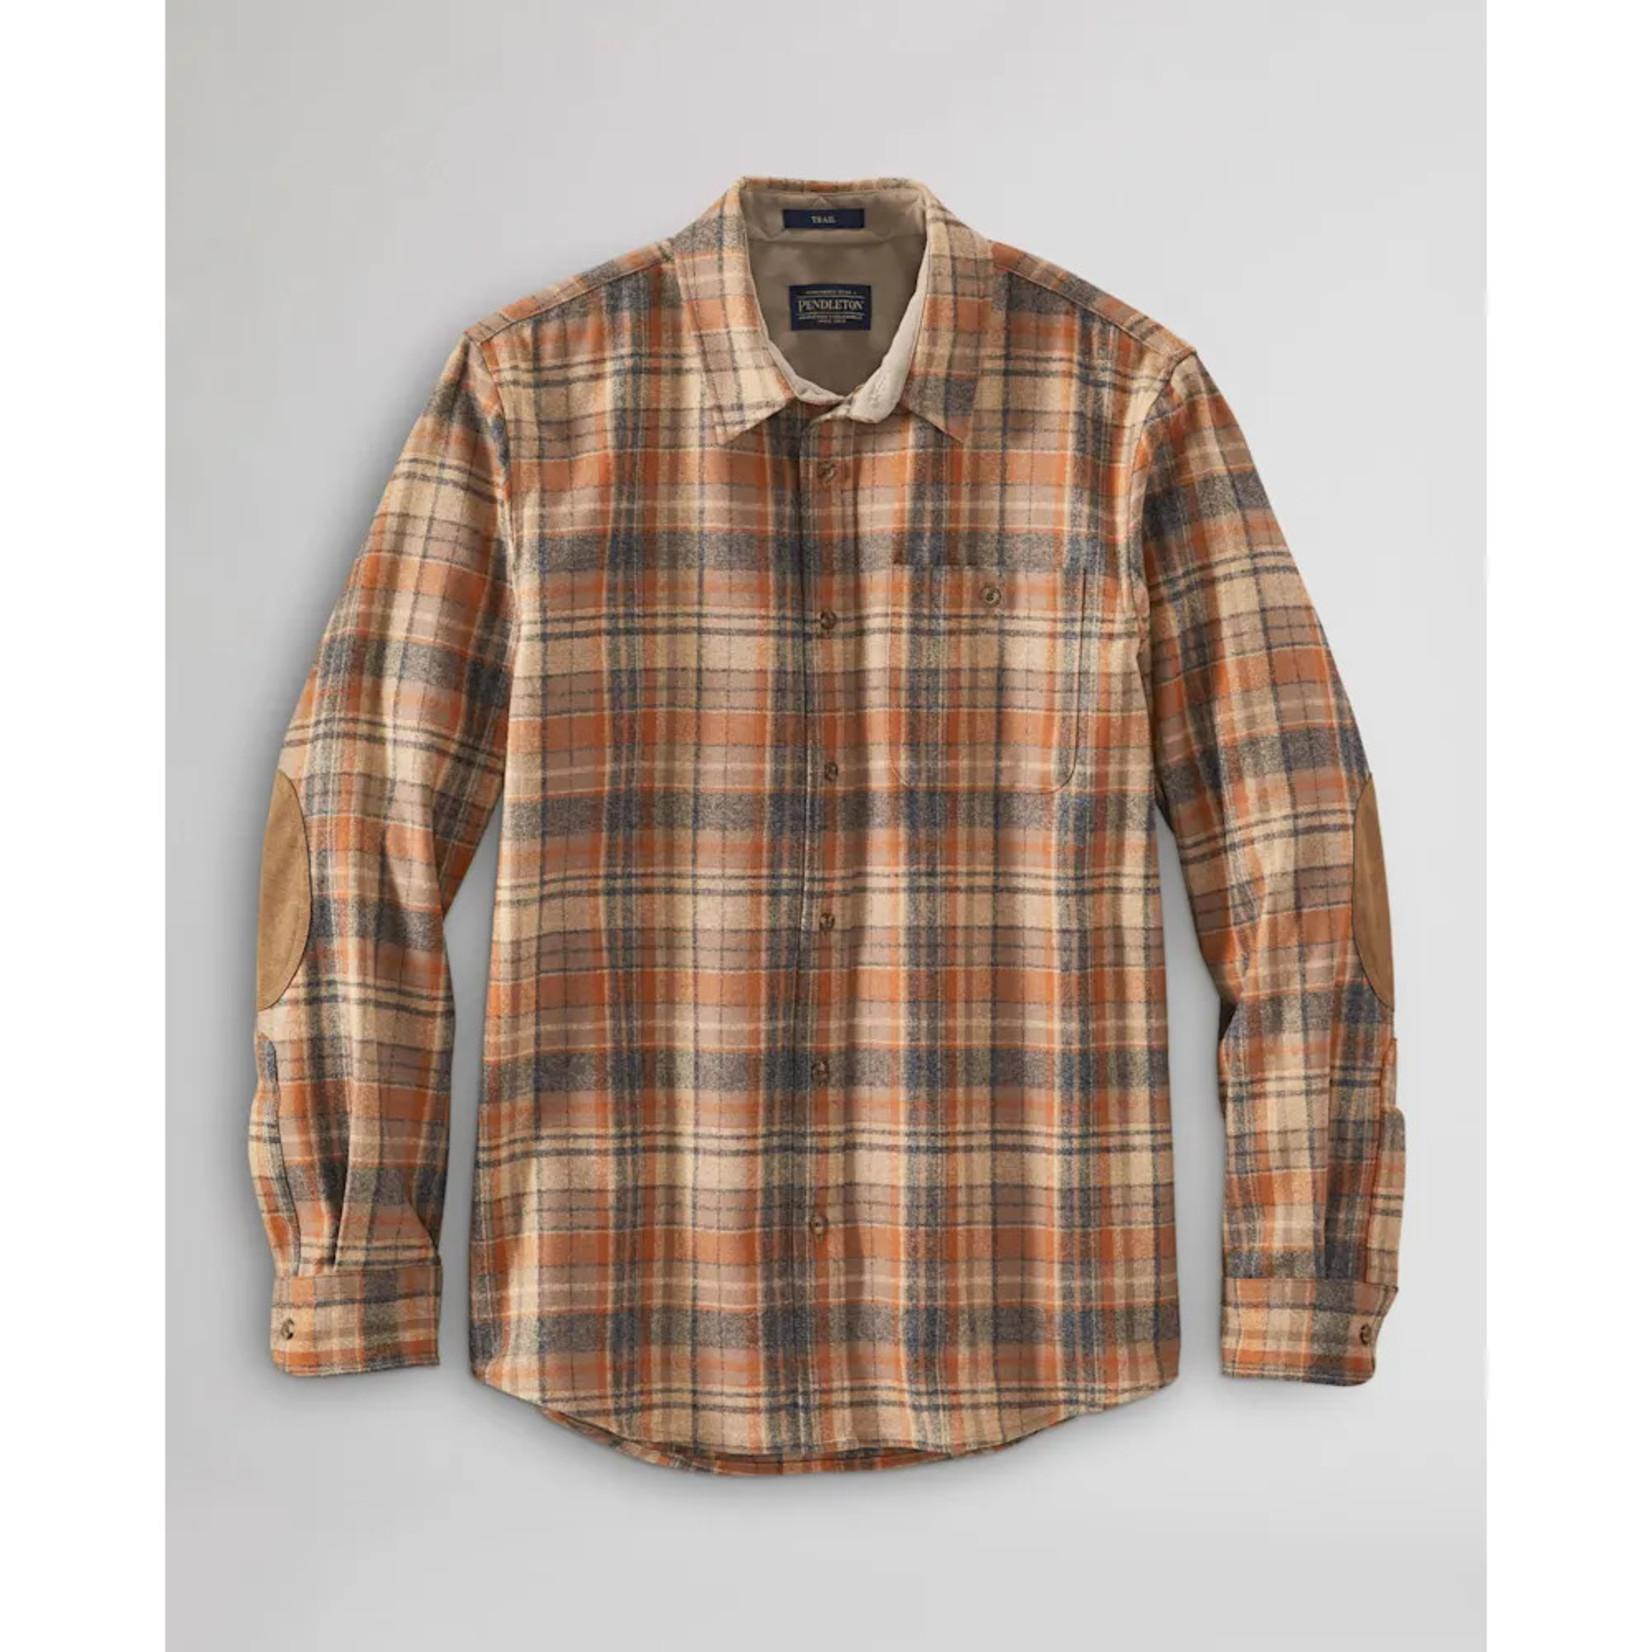 Pendleton Pendleton Fitted Trail Shirt RA639-32436